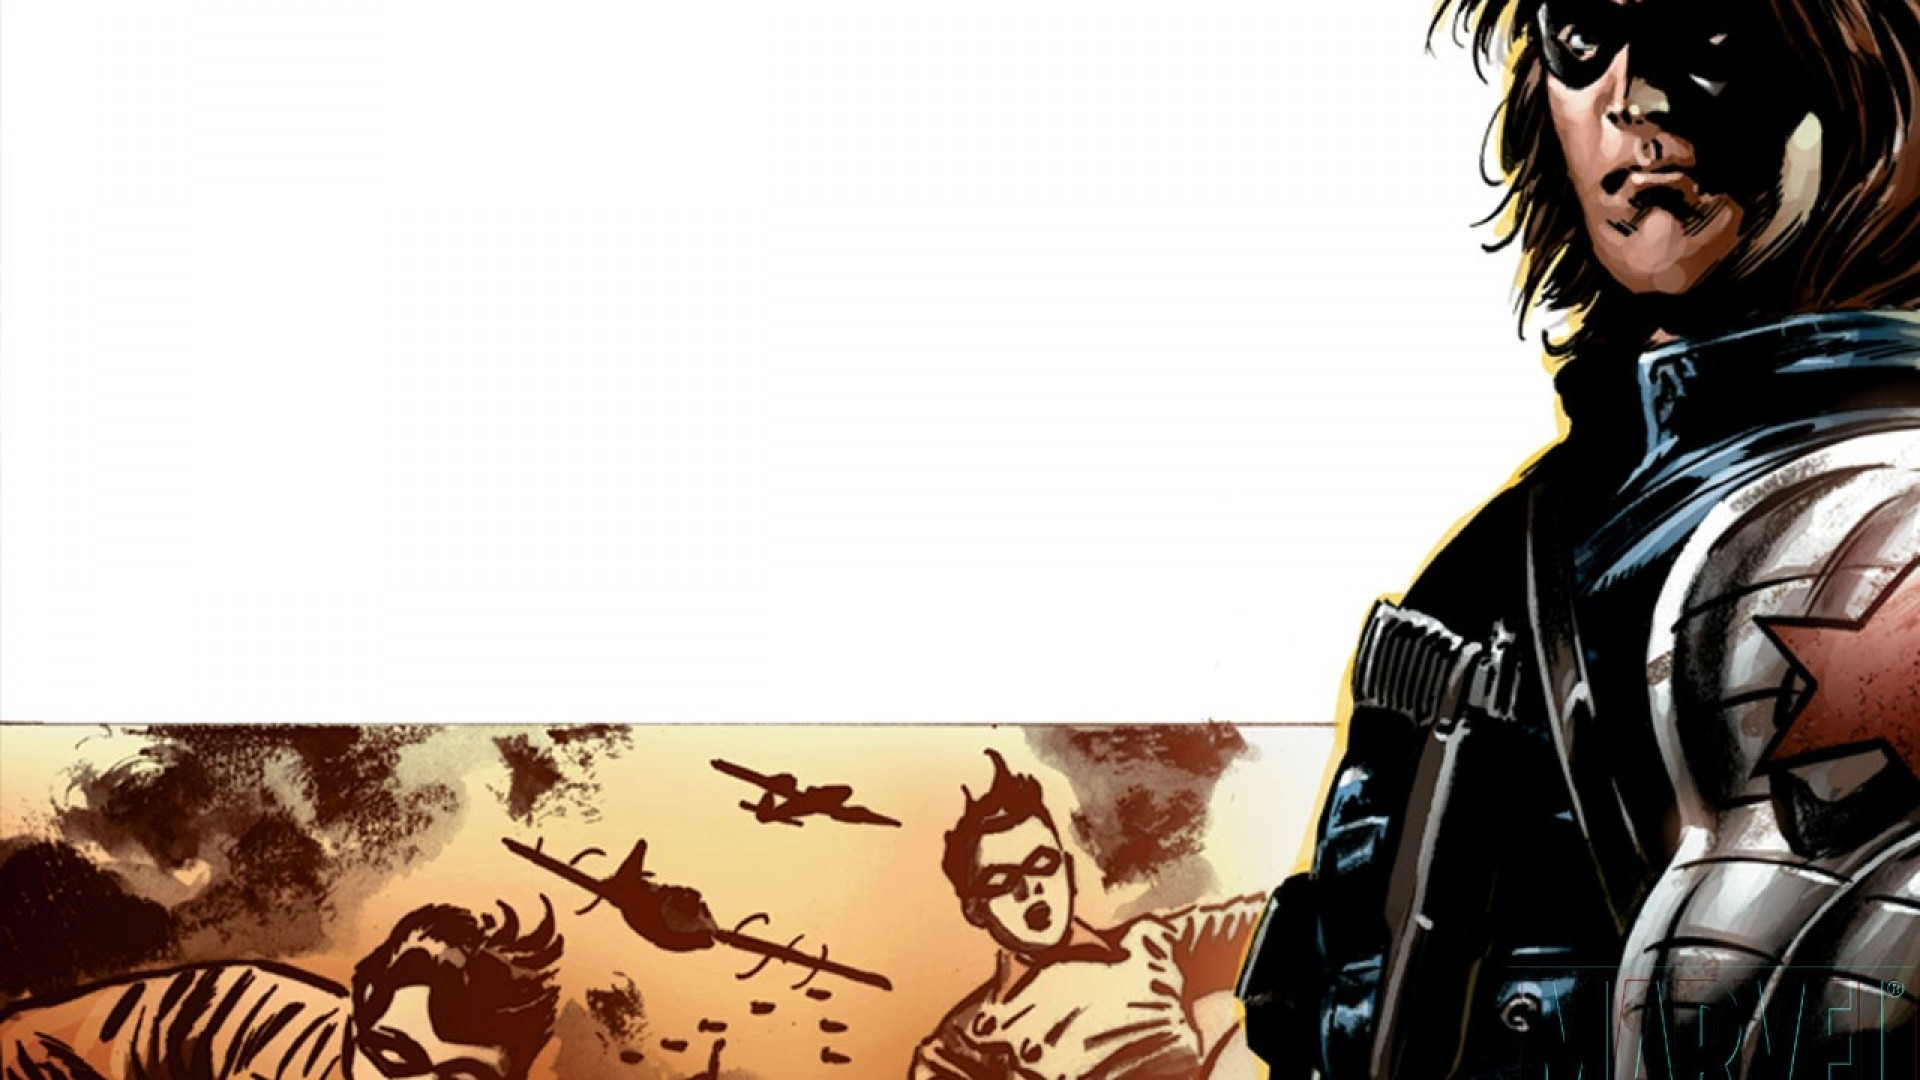 Captain America: The Winter Soldier HD Illustration